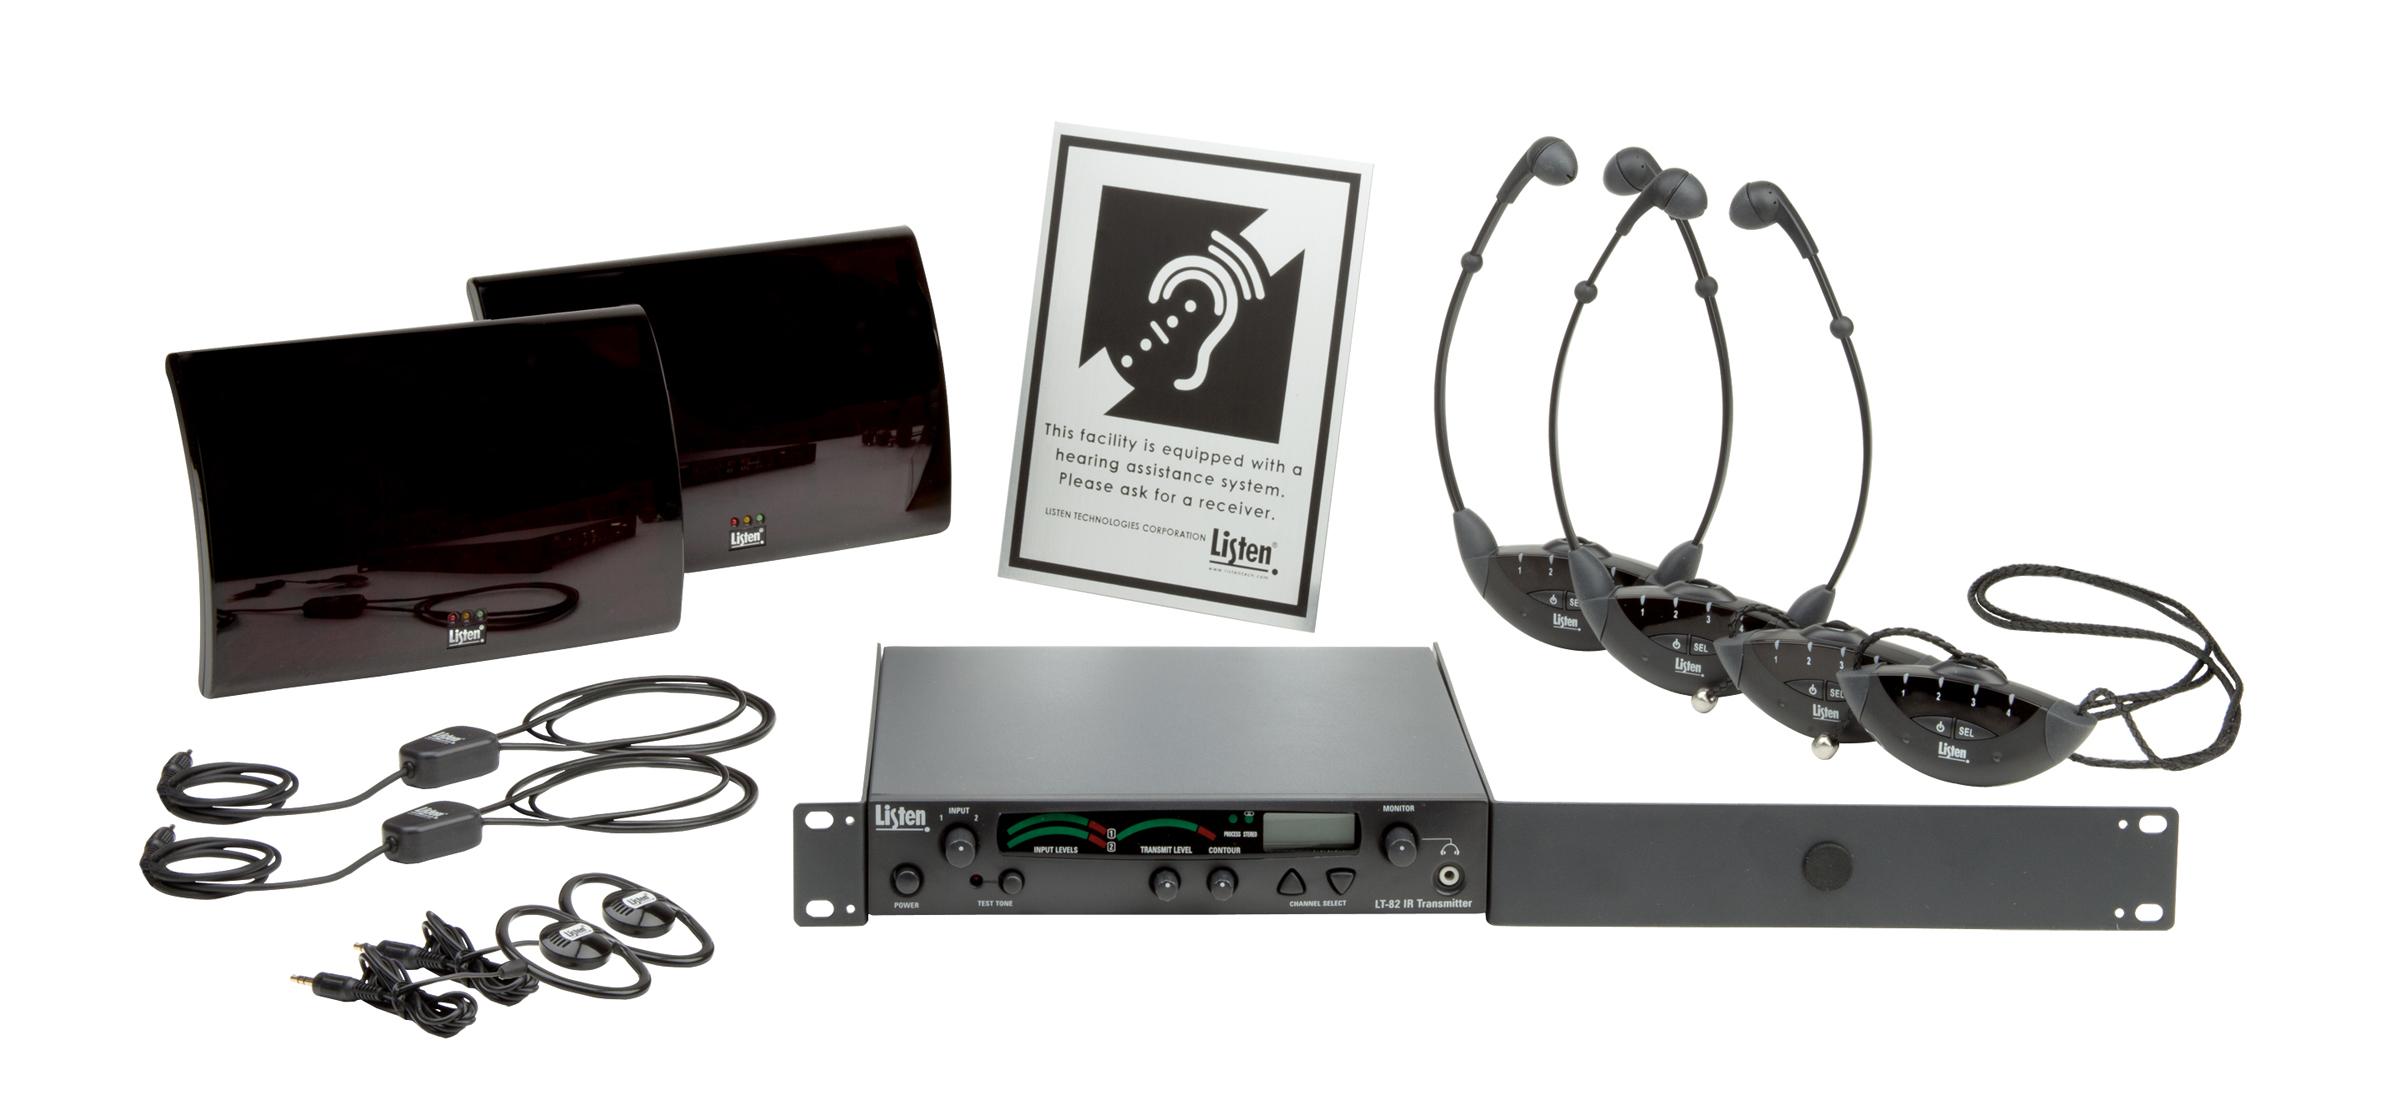 http://clynemedia.com/ListenTechnologies/NJC/Infrared_System.jpg